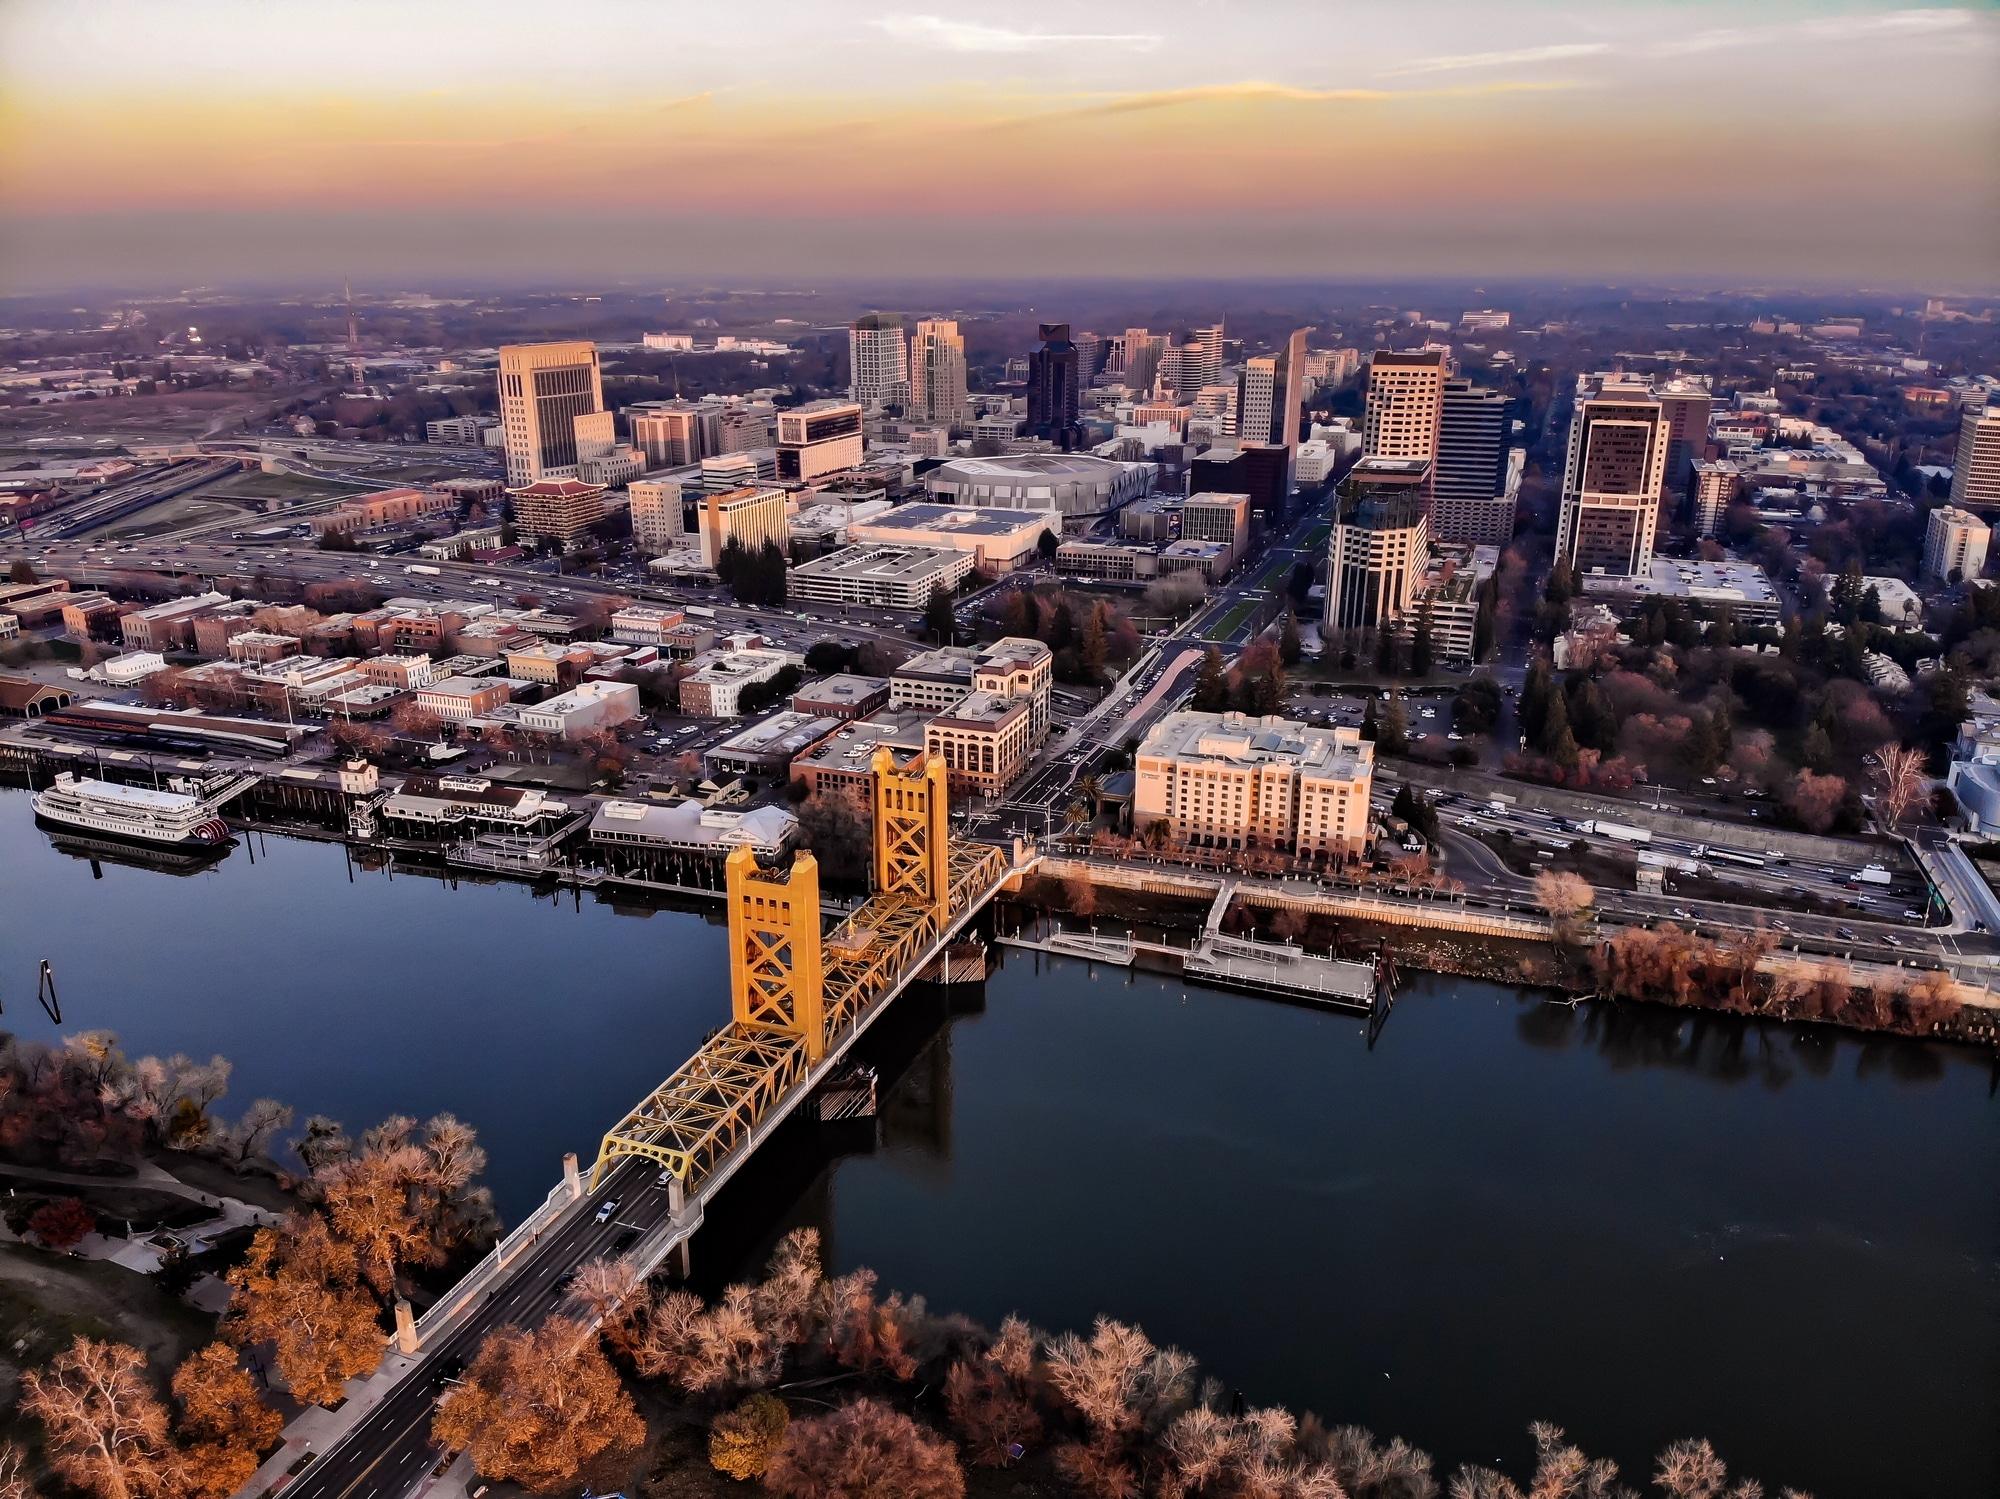 Sacramento from above